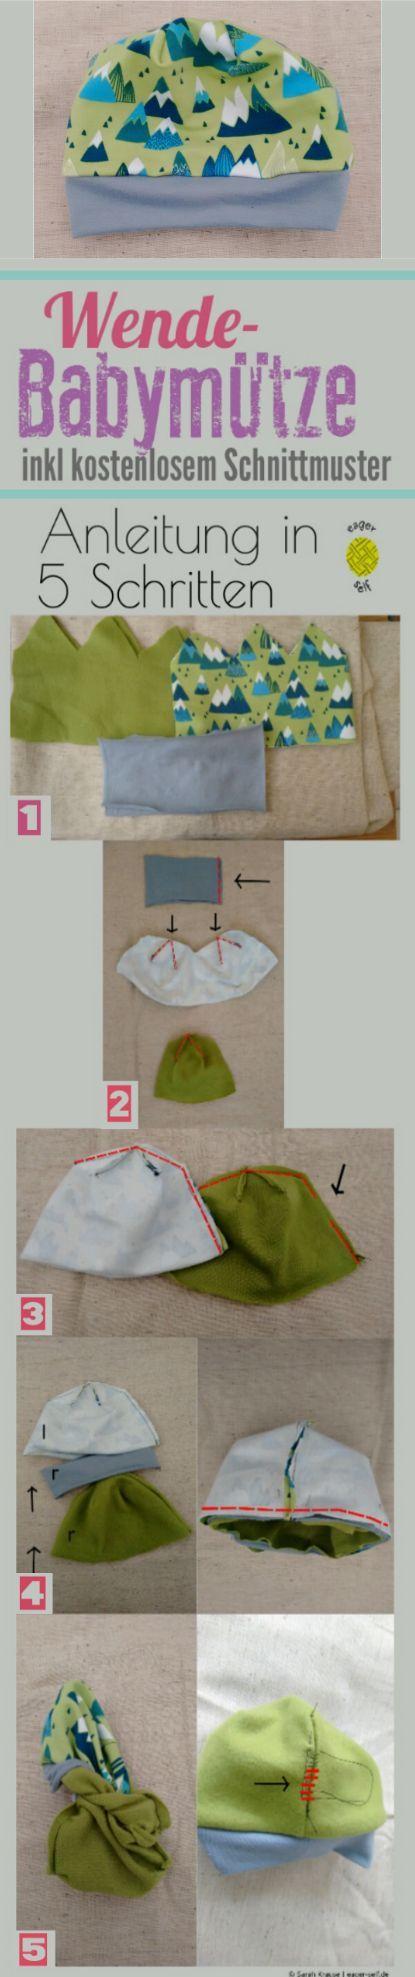 Babymütze nähen Anleitung Schnittmuster kostenlos